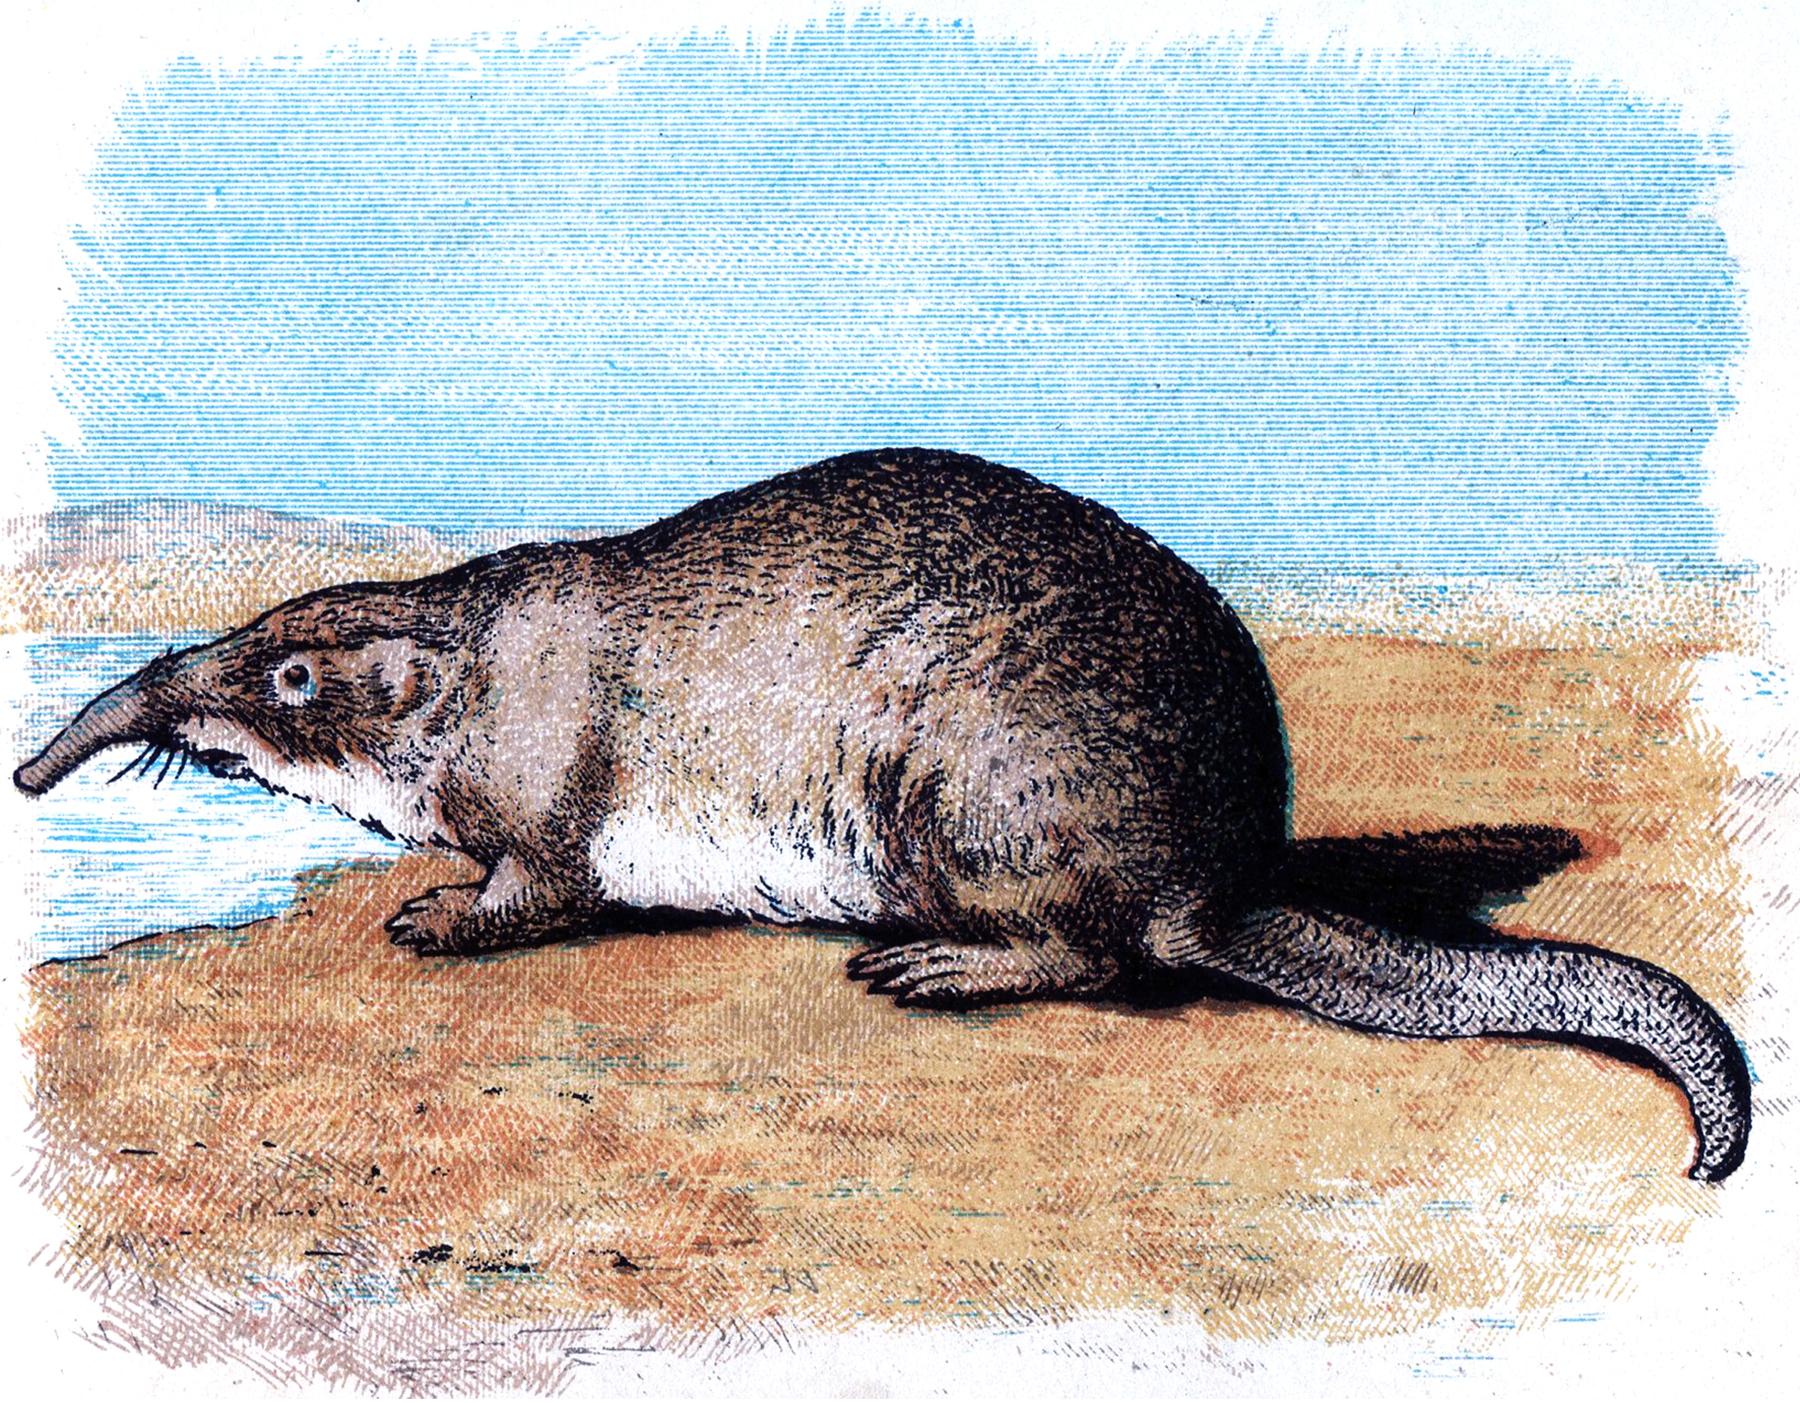 Vintage Mole Image